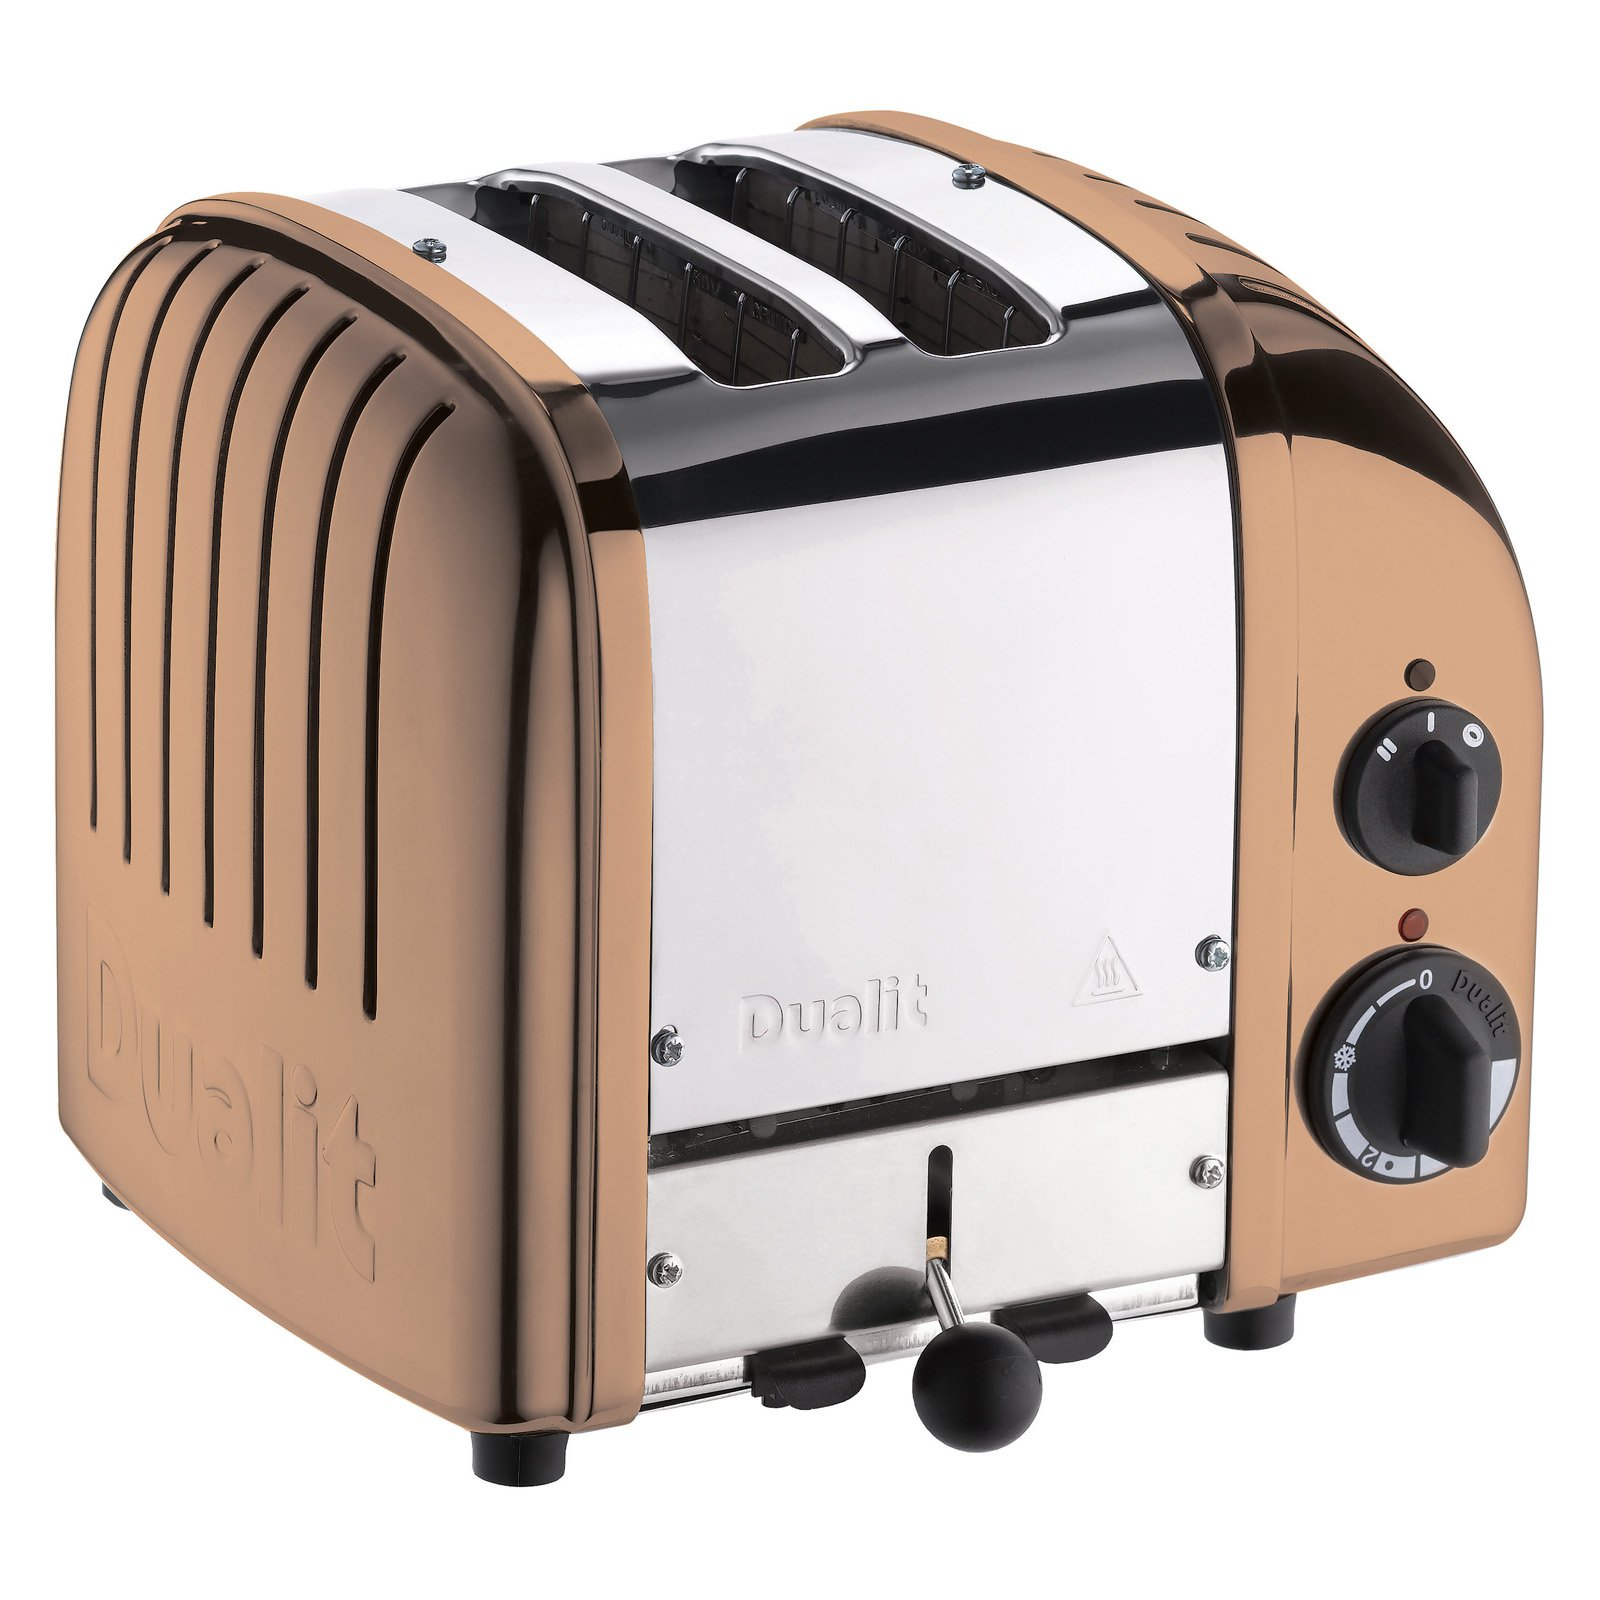 Dualit 27440 2 Slice NewGen Toaster - Copper